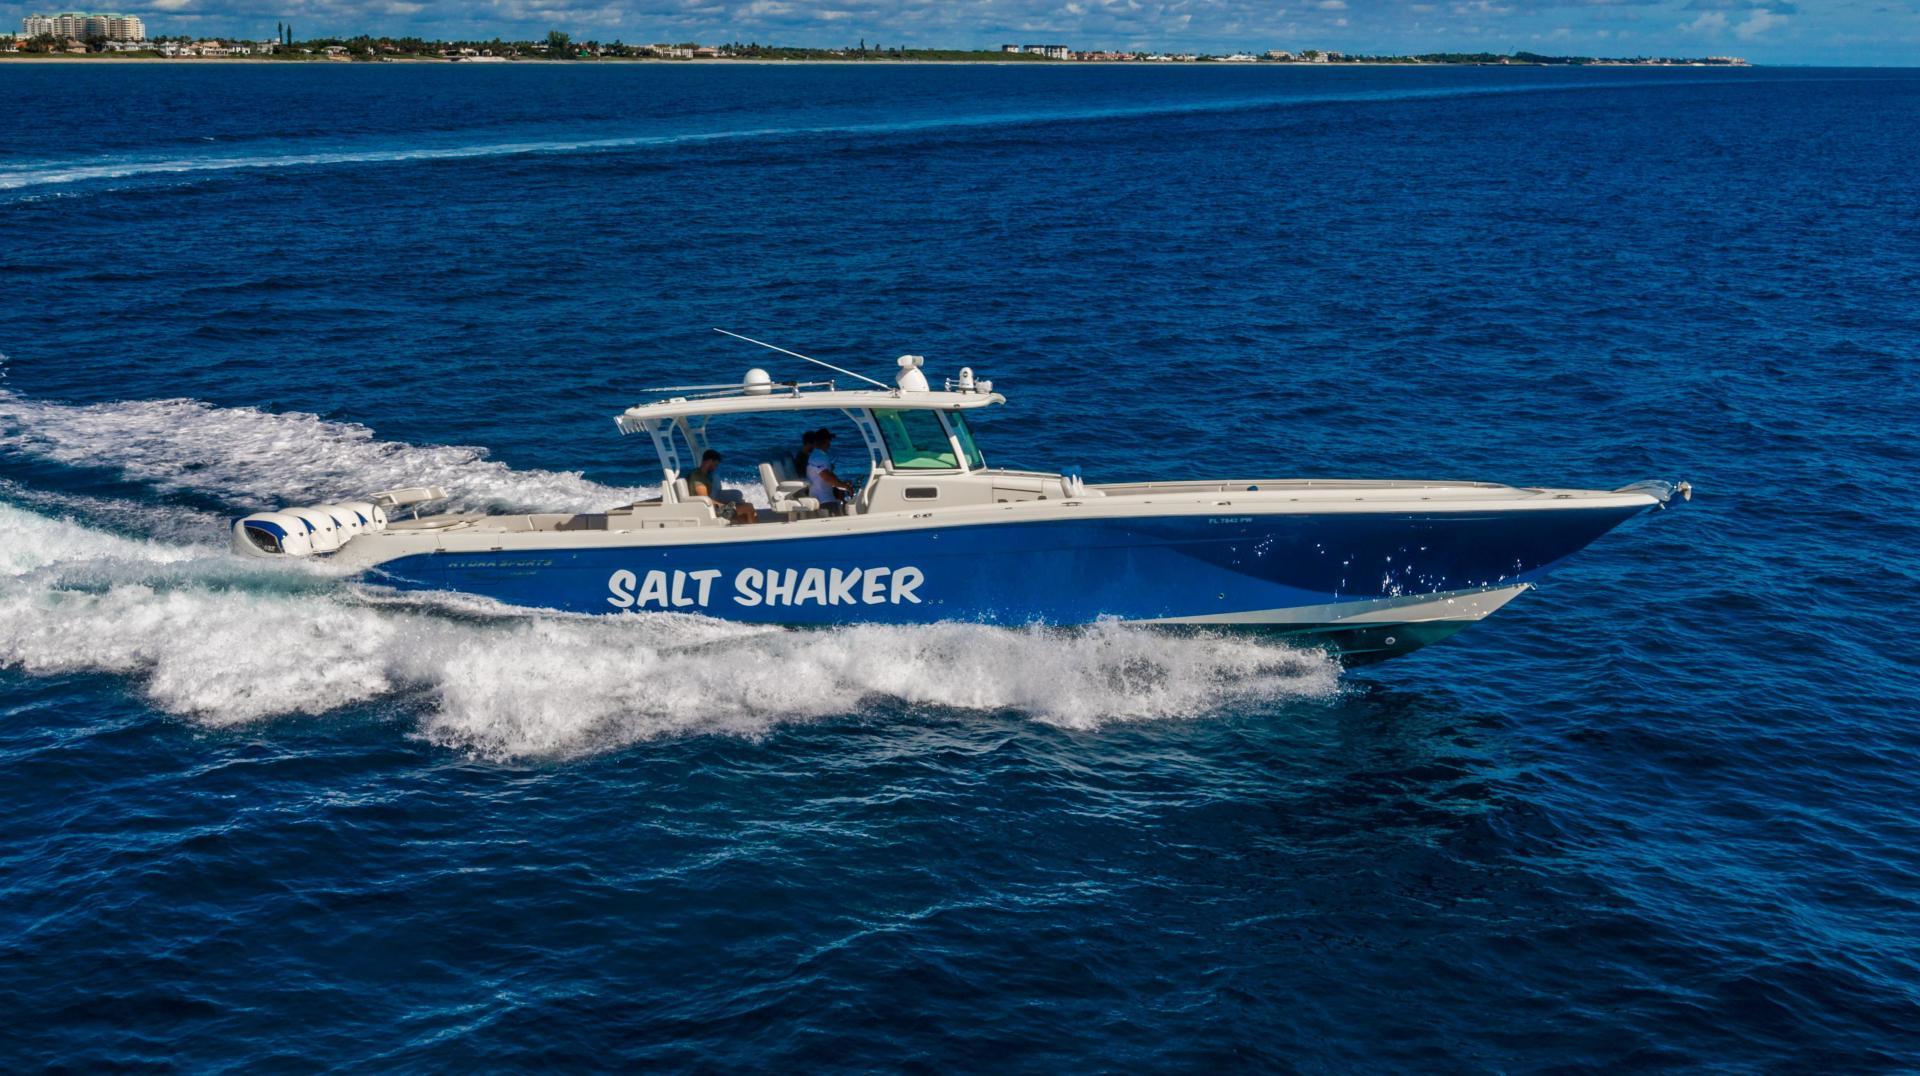 HCB-Suenos 2016-Salt Shaker Ft. Lauderdale-Florida-United States-1548630 | Thumbnail